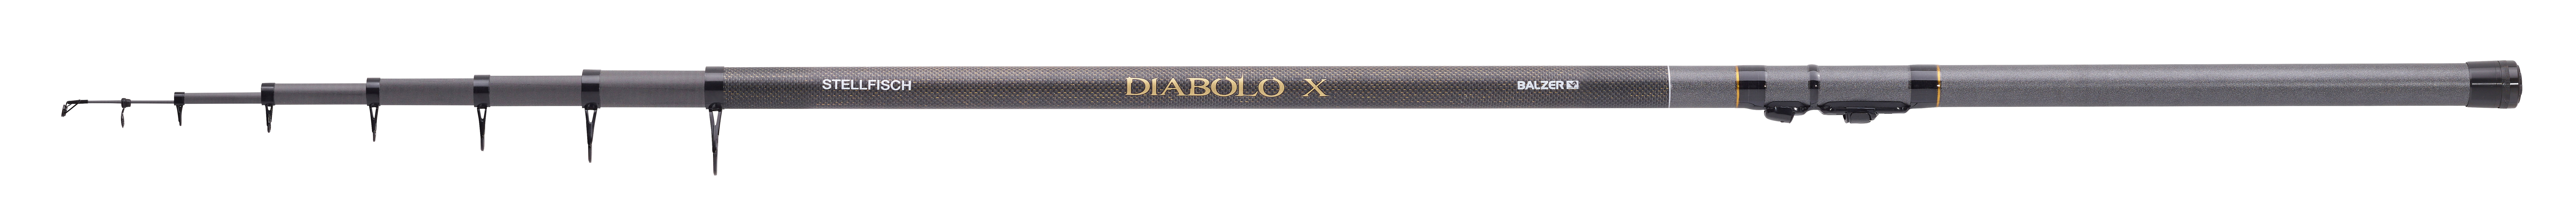 Meerforellenrute Balzer Diabolo NEO IM7 Carbon Meerforelle 3.10m 10-45g